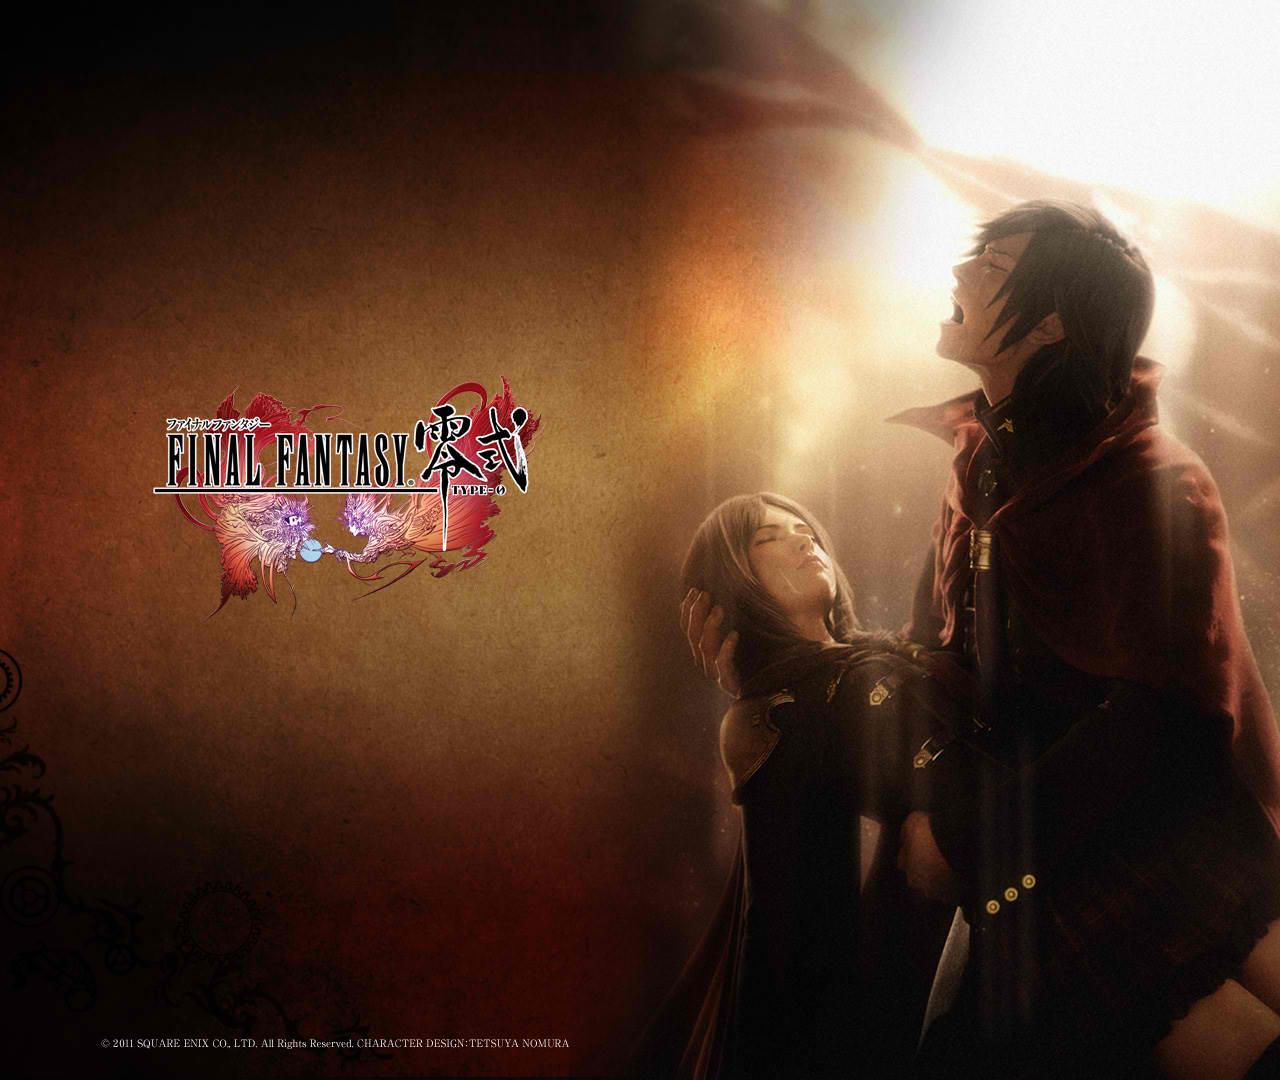 Hd Final Fantasy Wallpaper: Final Fantasy Live Wallpaper